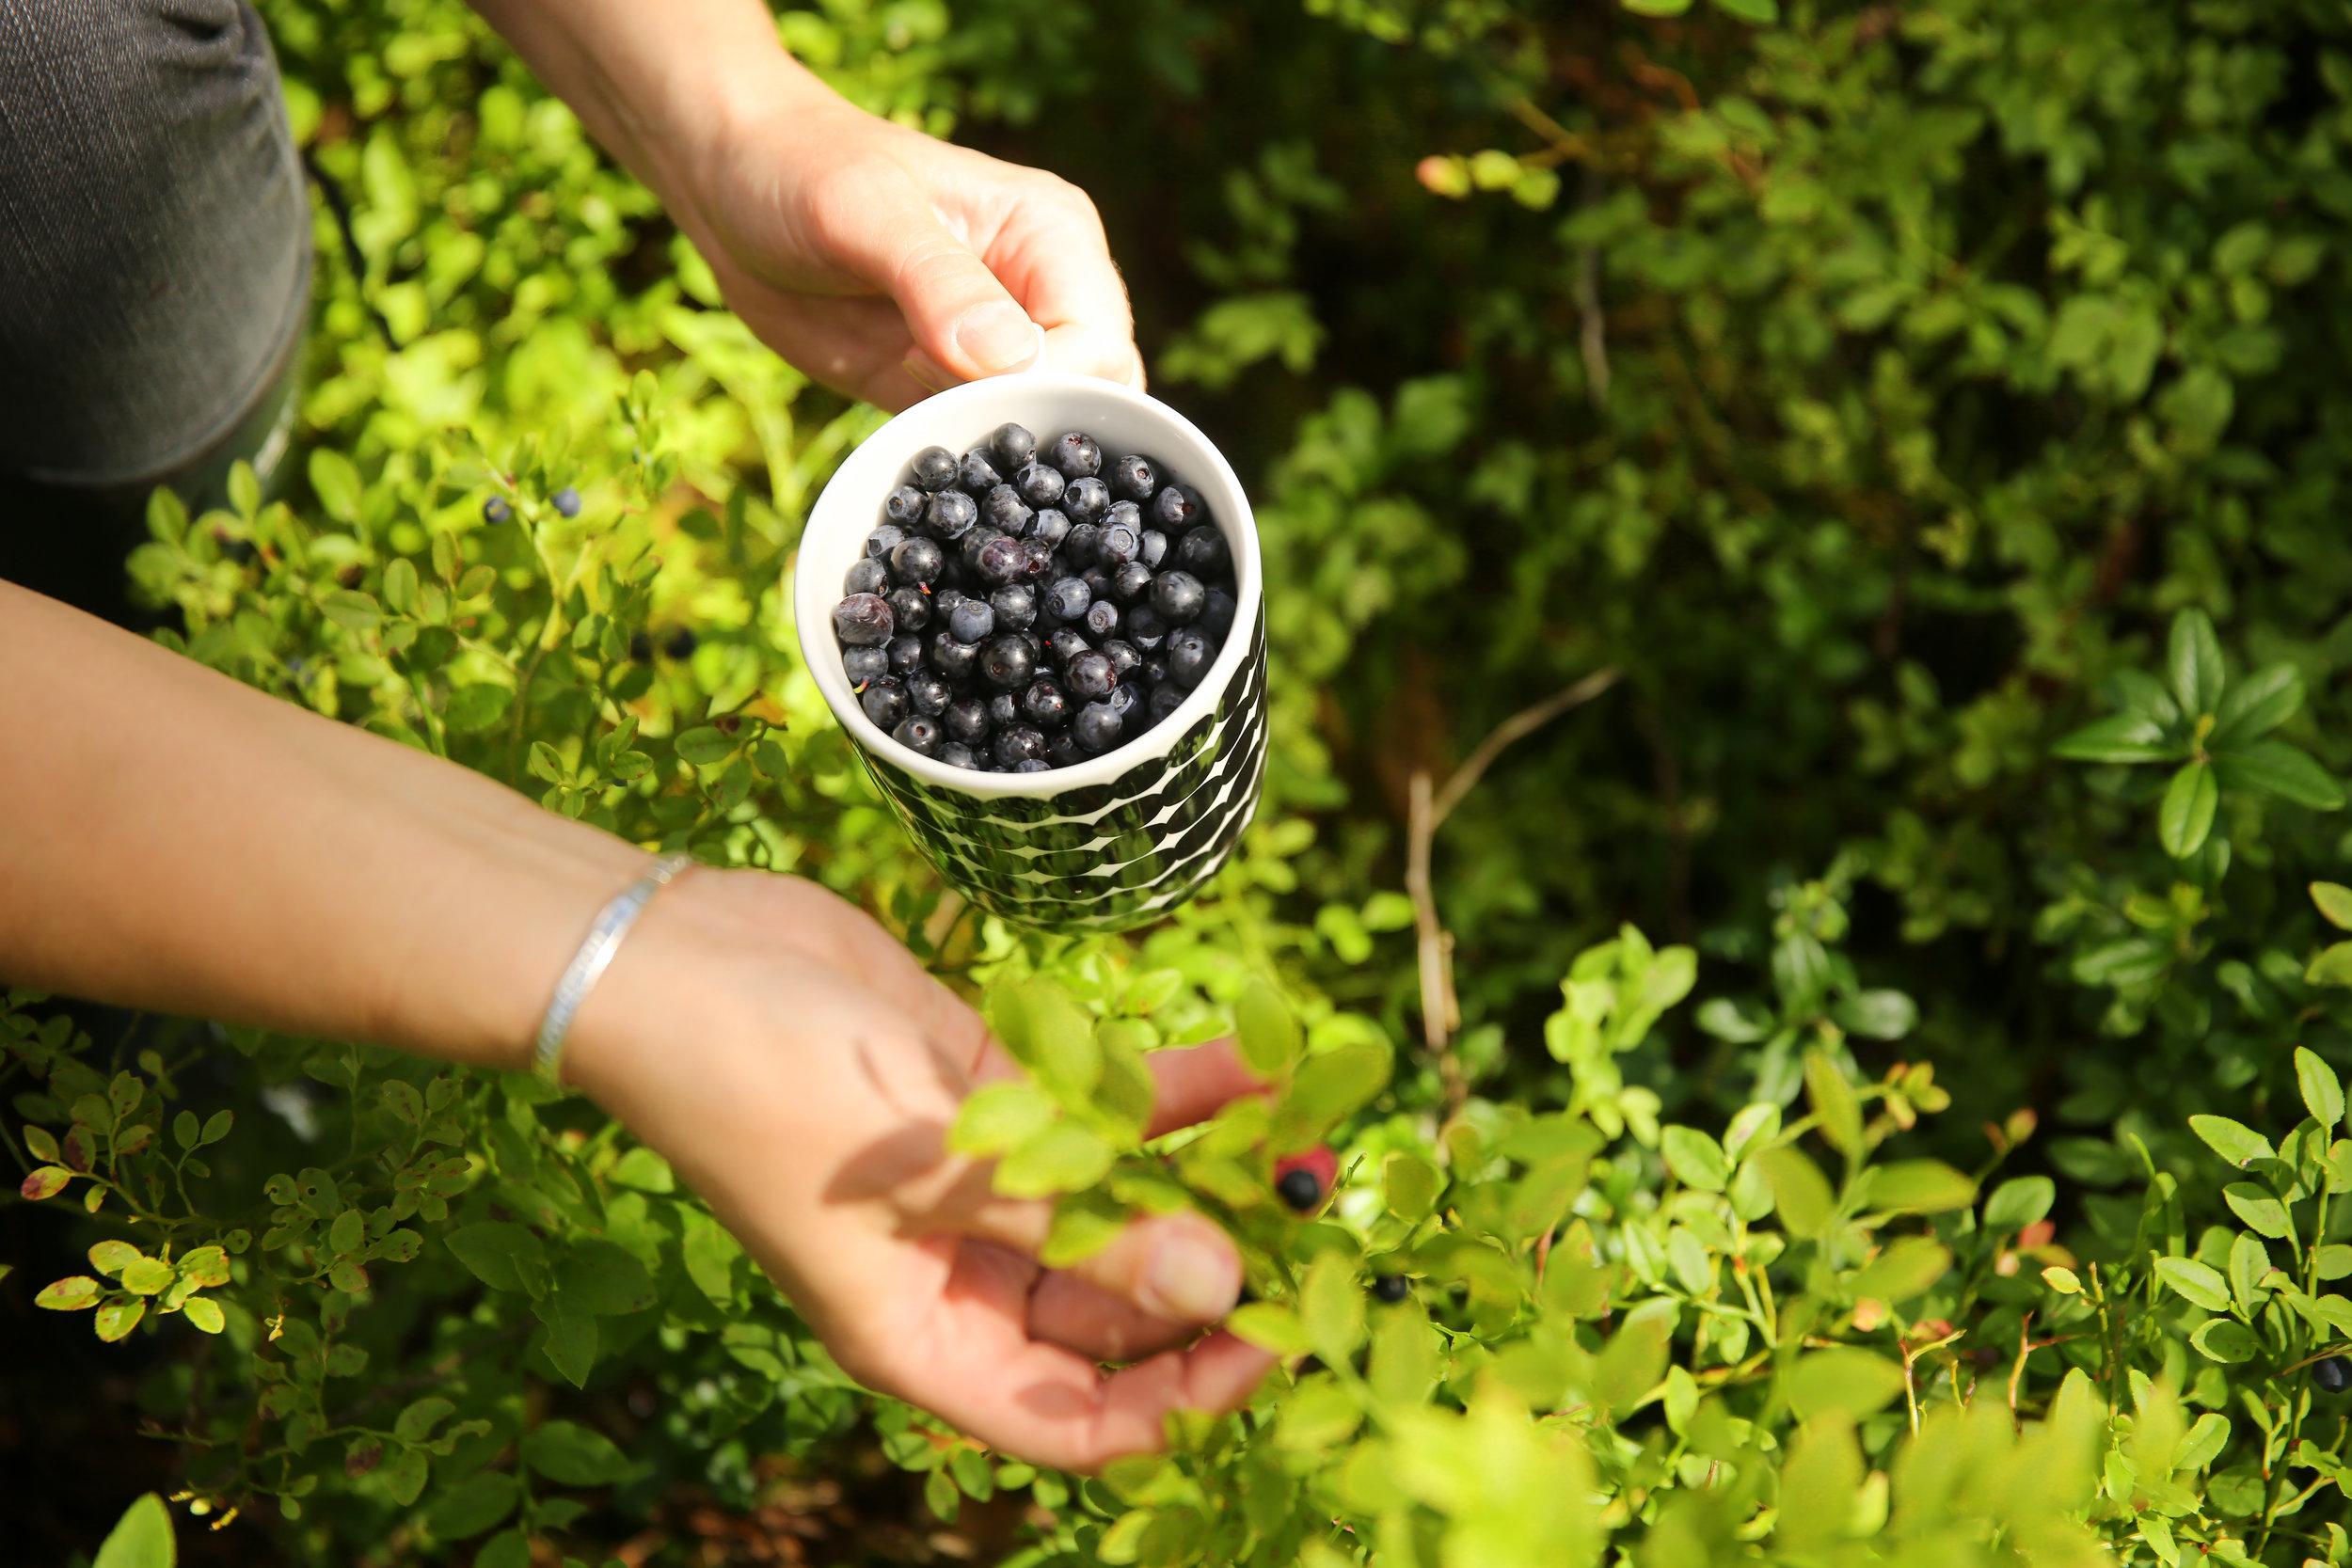 Picking blueberries. Visit Finland, Harri Tarvainen